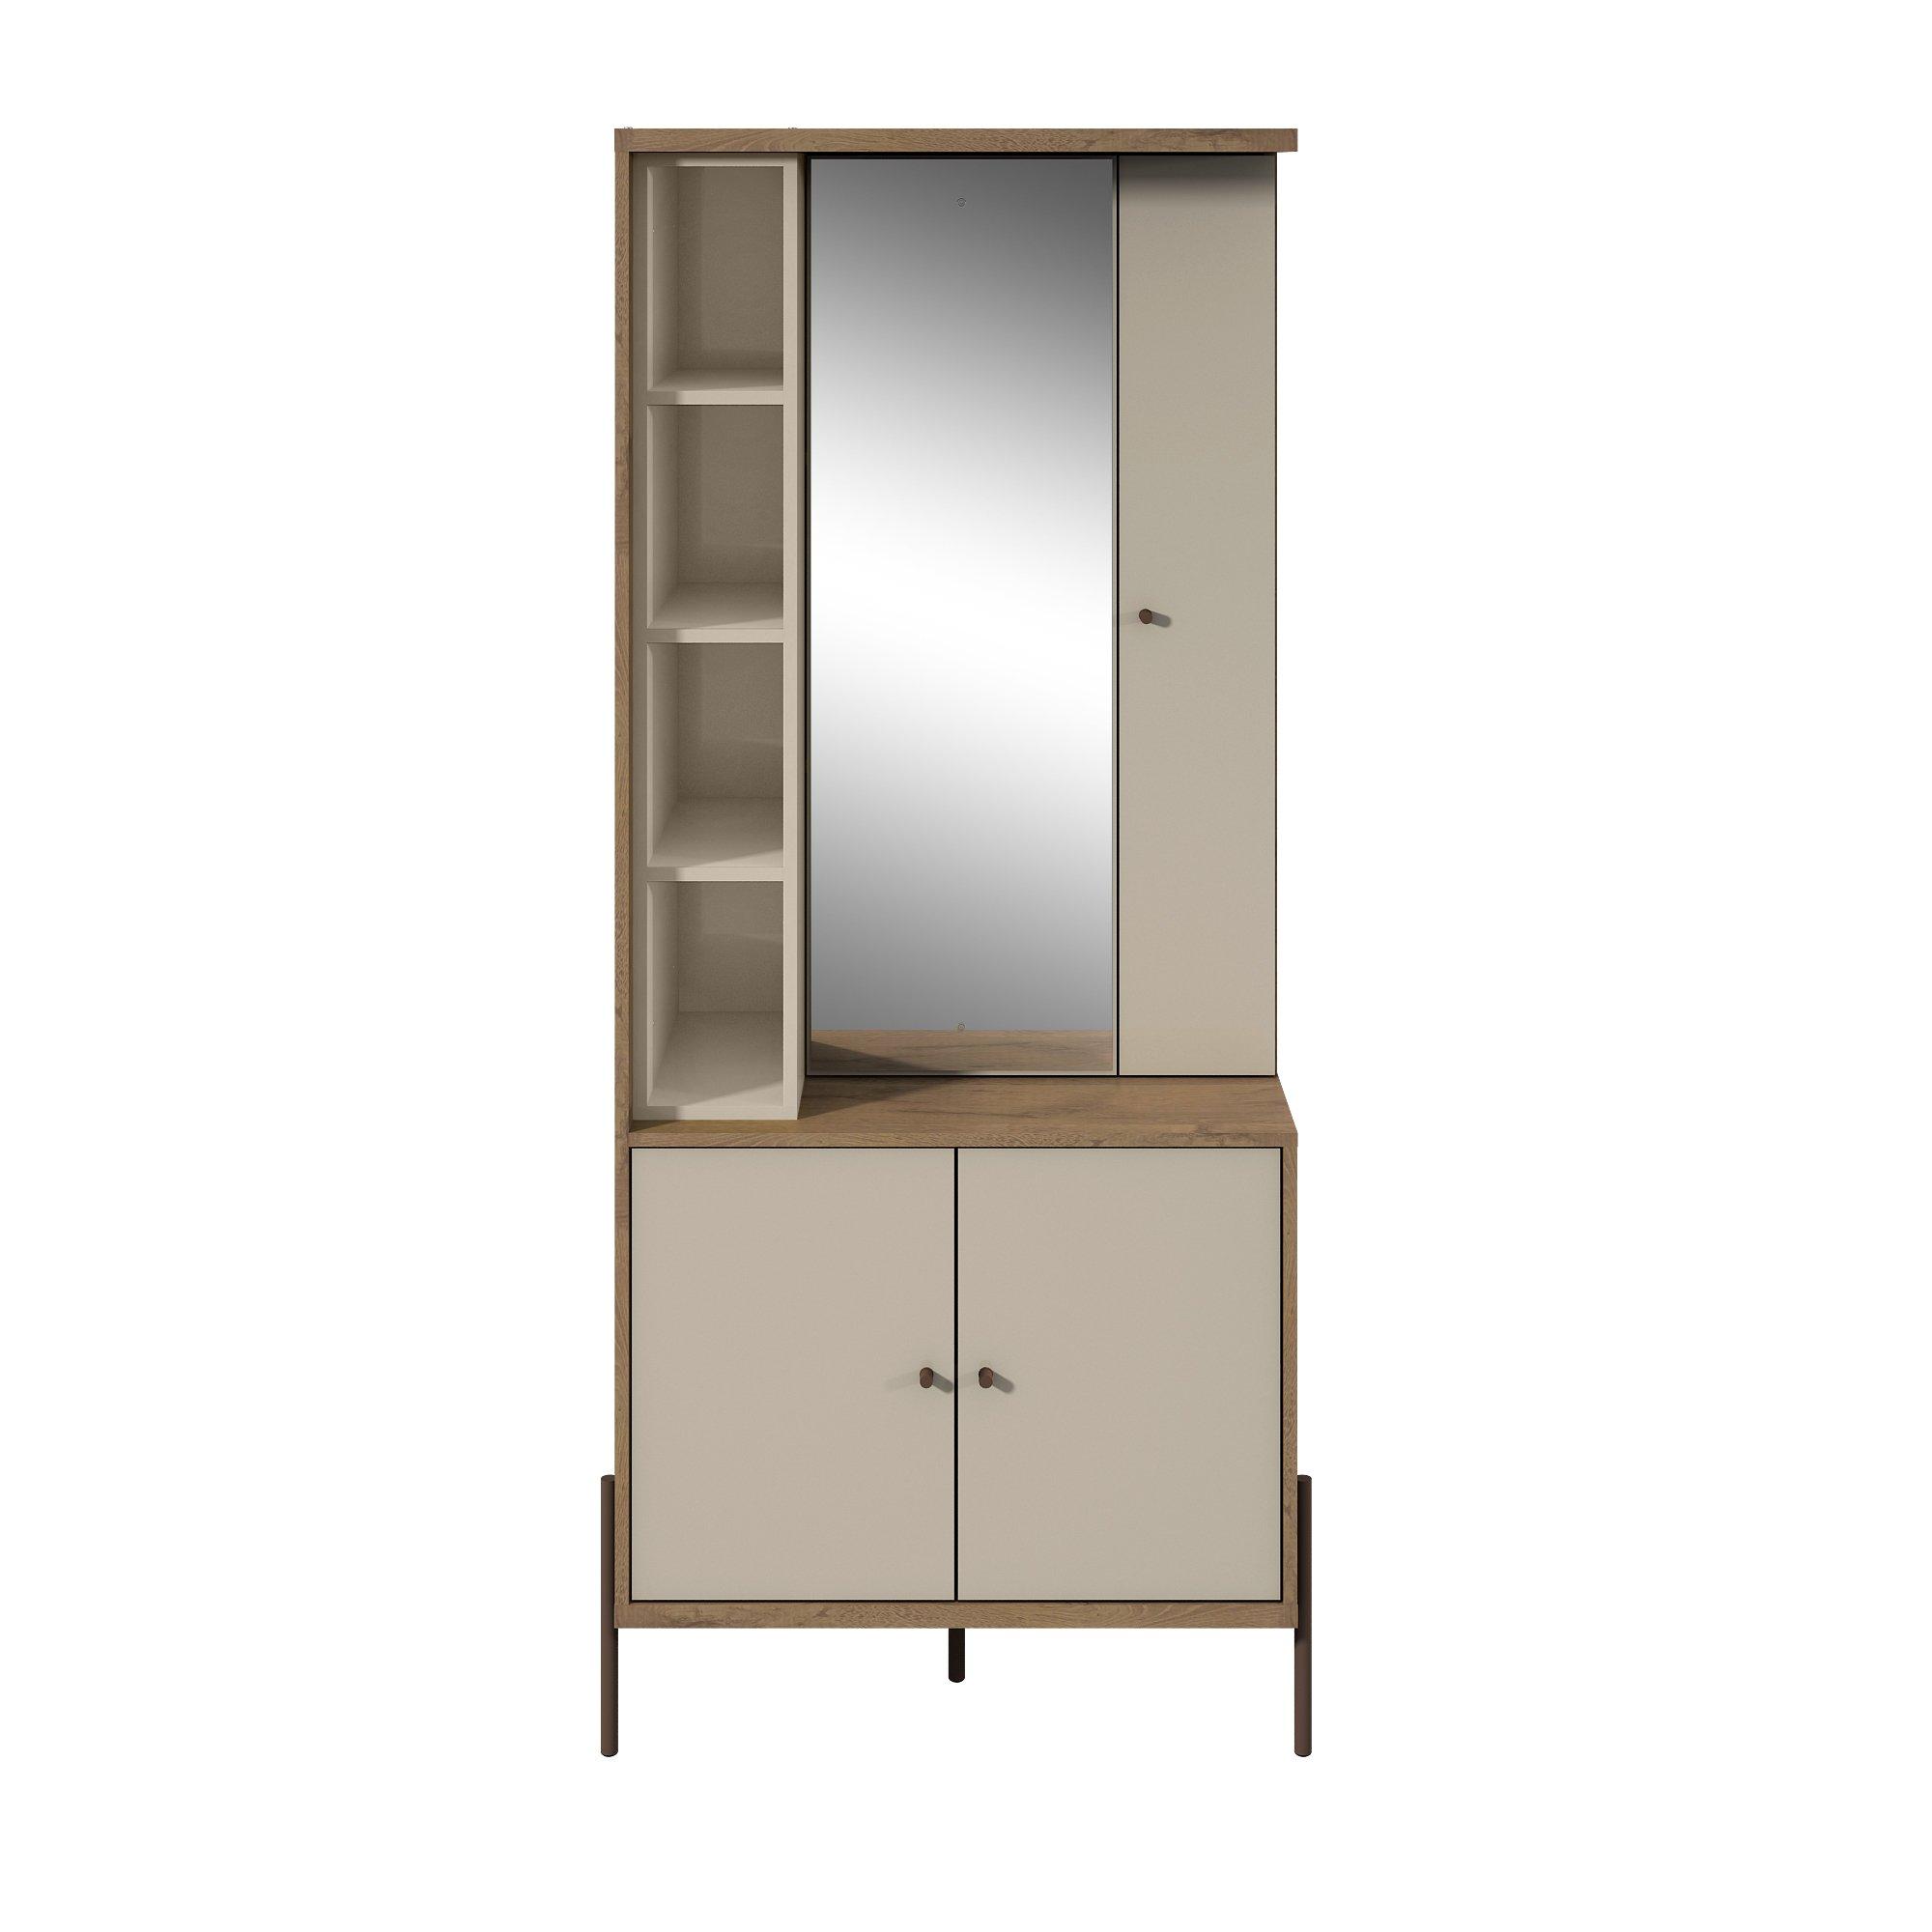 Manhattan Comfort 350714 Joy Series Large Bedroom Storage Jewelry Vanity Armoire, Off- Off-White